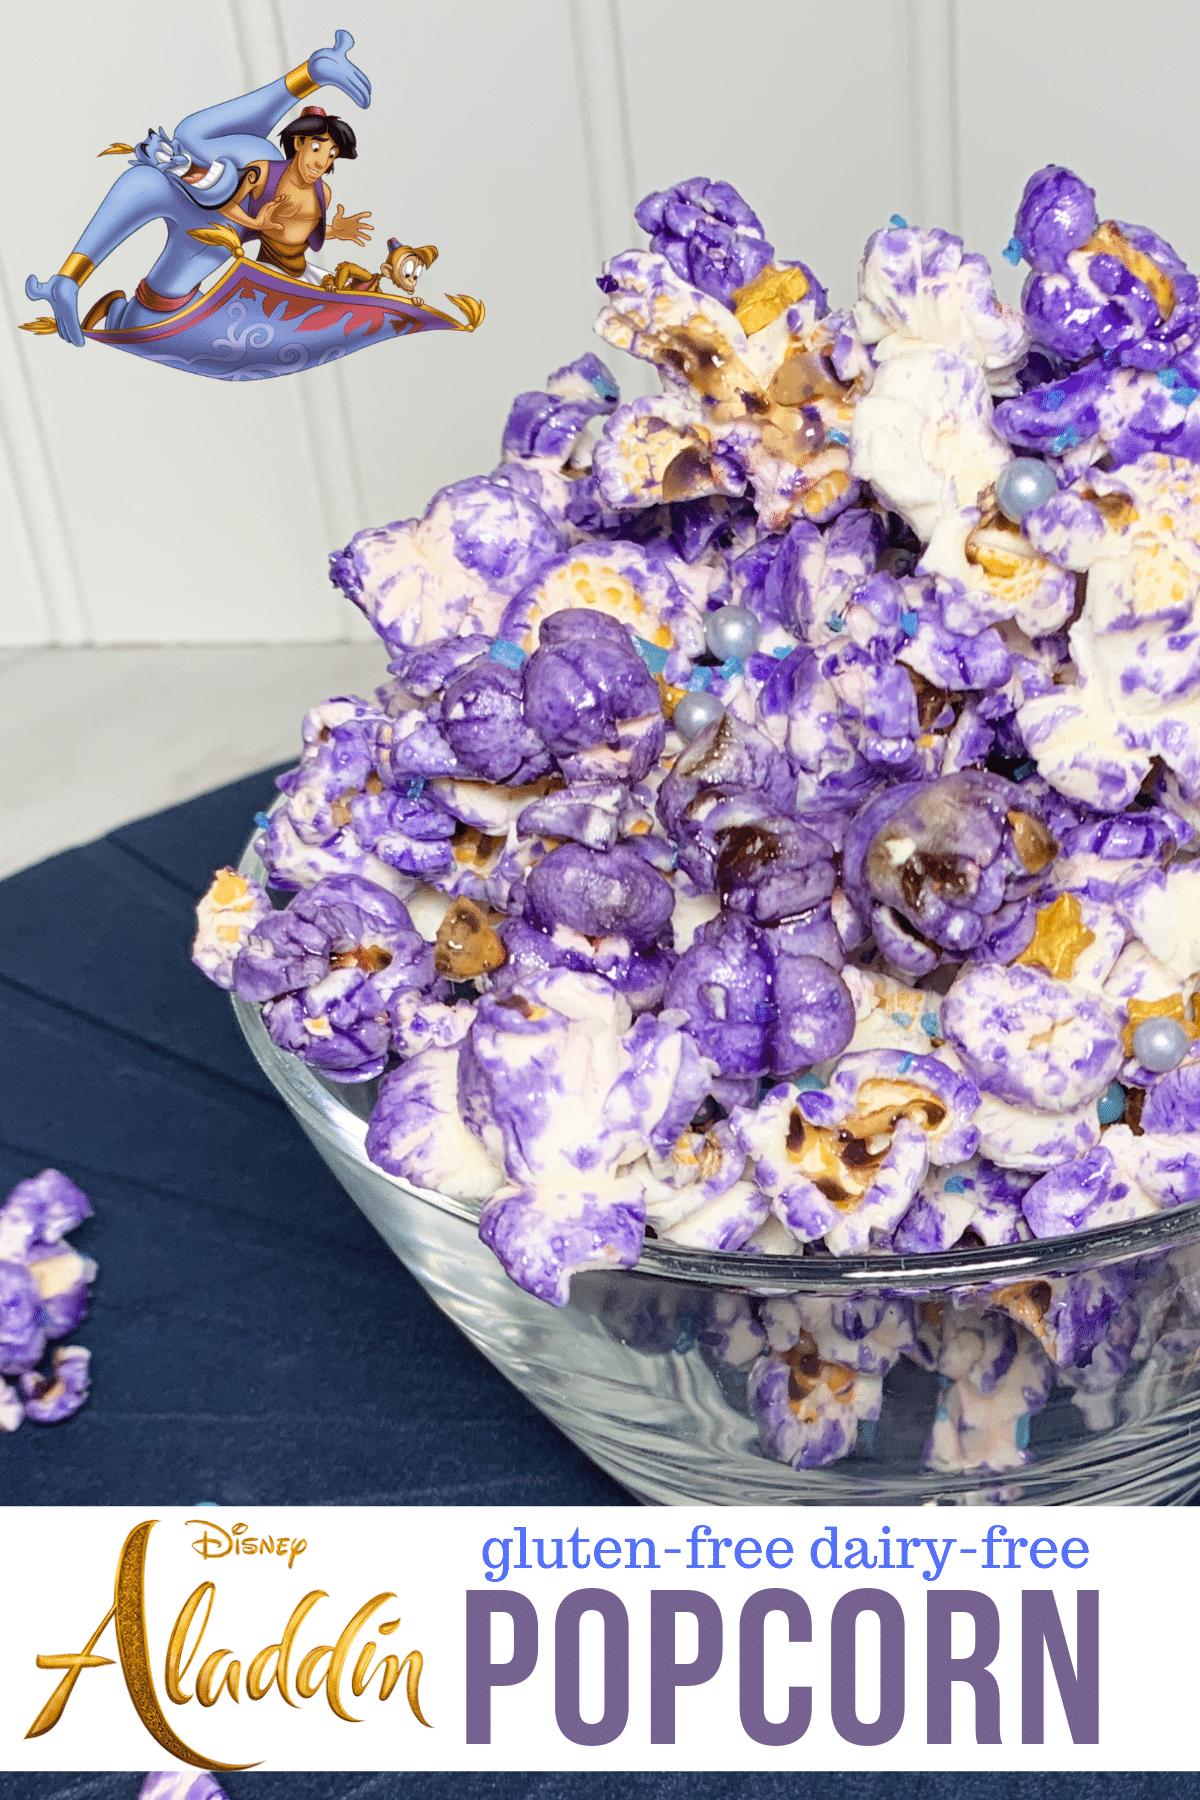 Aladdin popcorn gluten free and dairy free